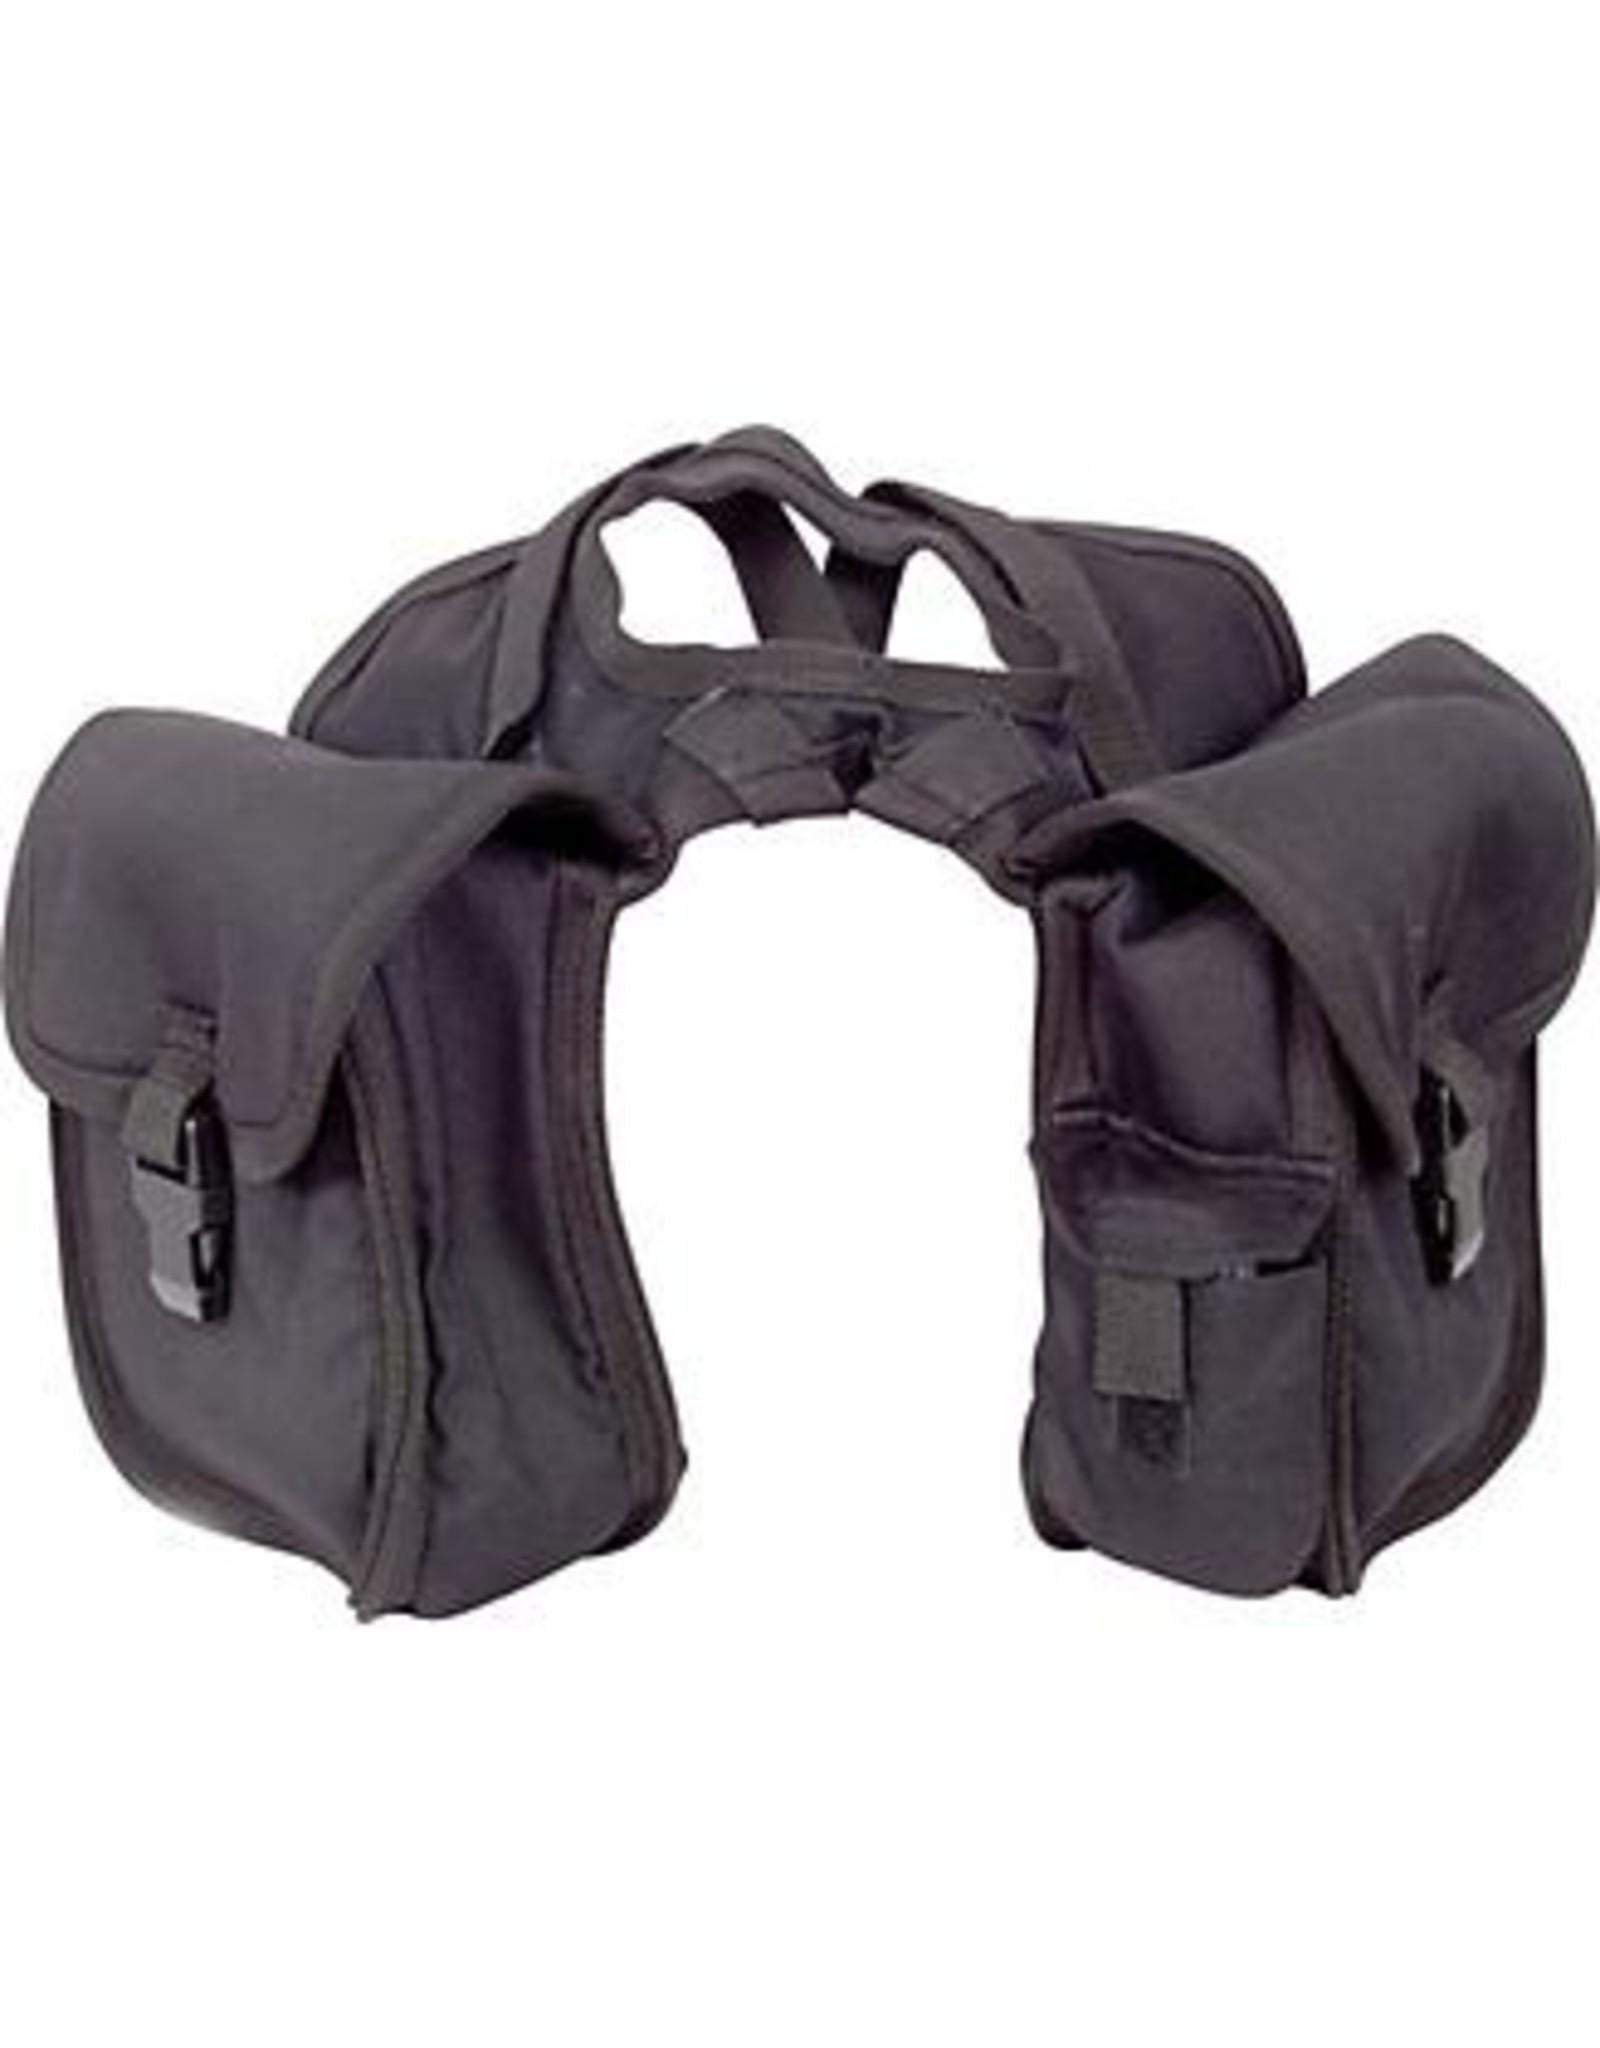 Cashel Small Horn Bag